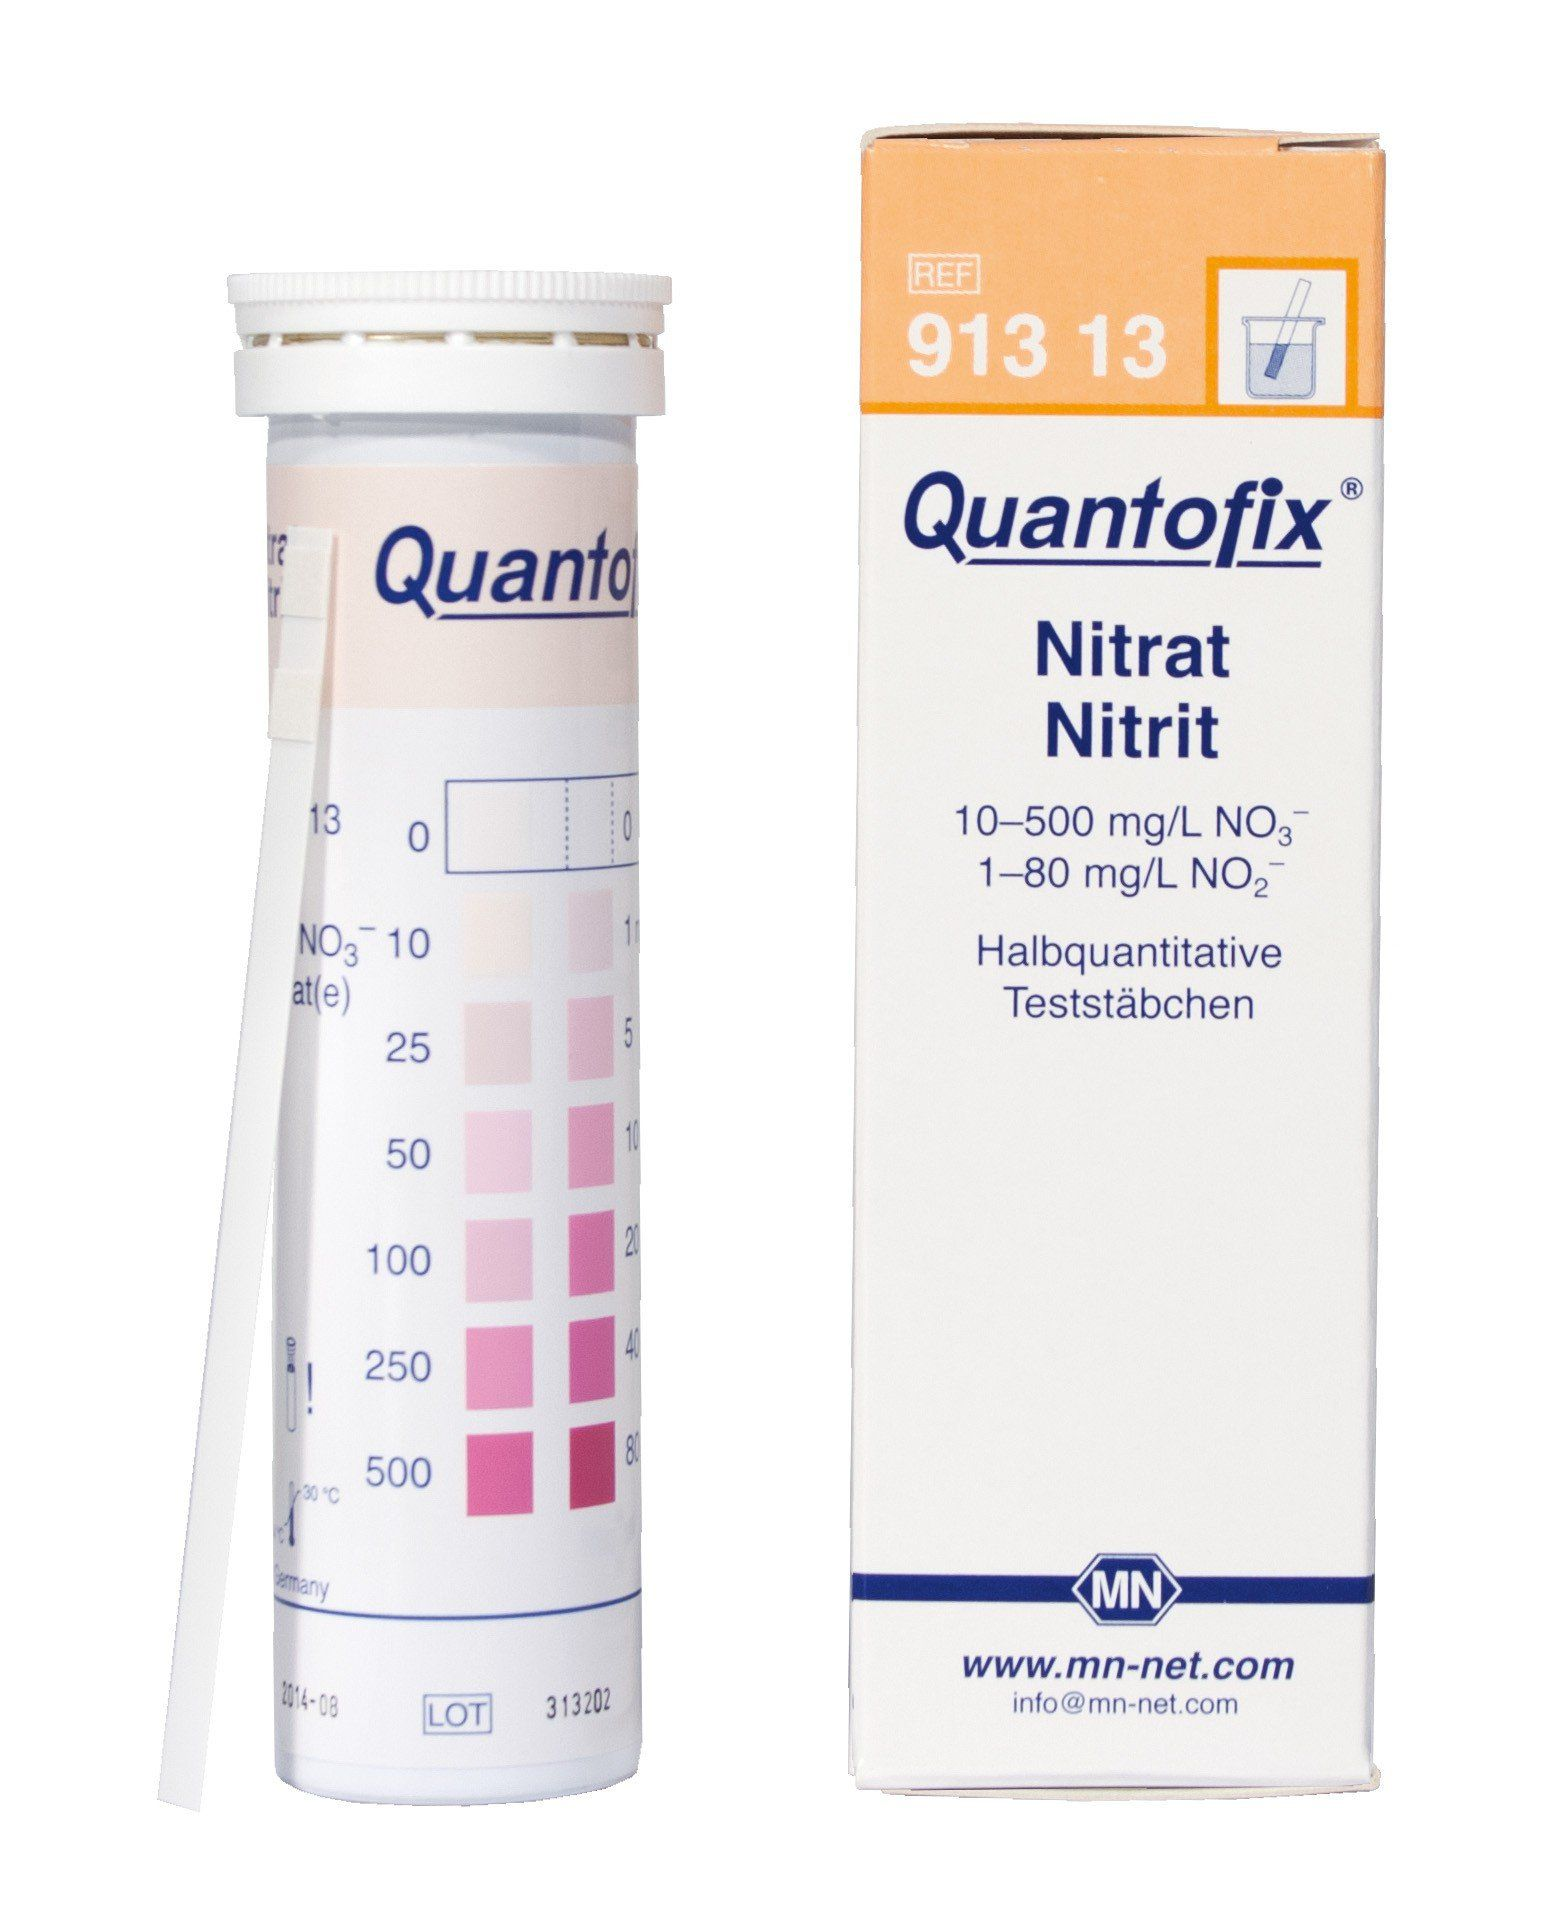 QUANTOFIX NITRATO/NITRITO 0-500MG/L NO3 0-80MG/L NO2 EM TIRAS